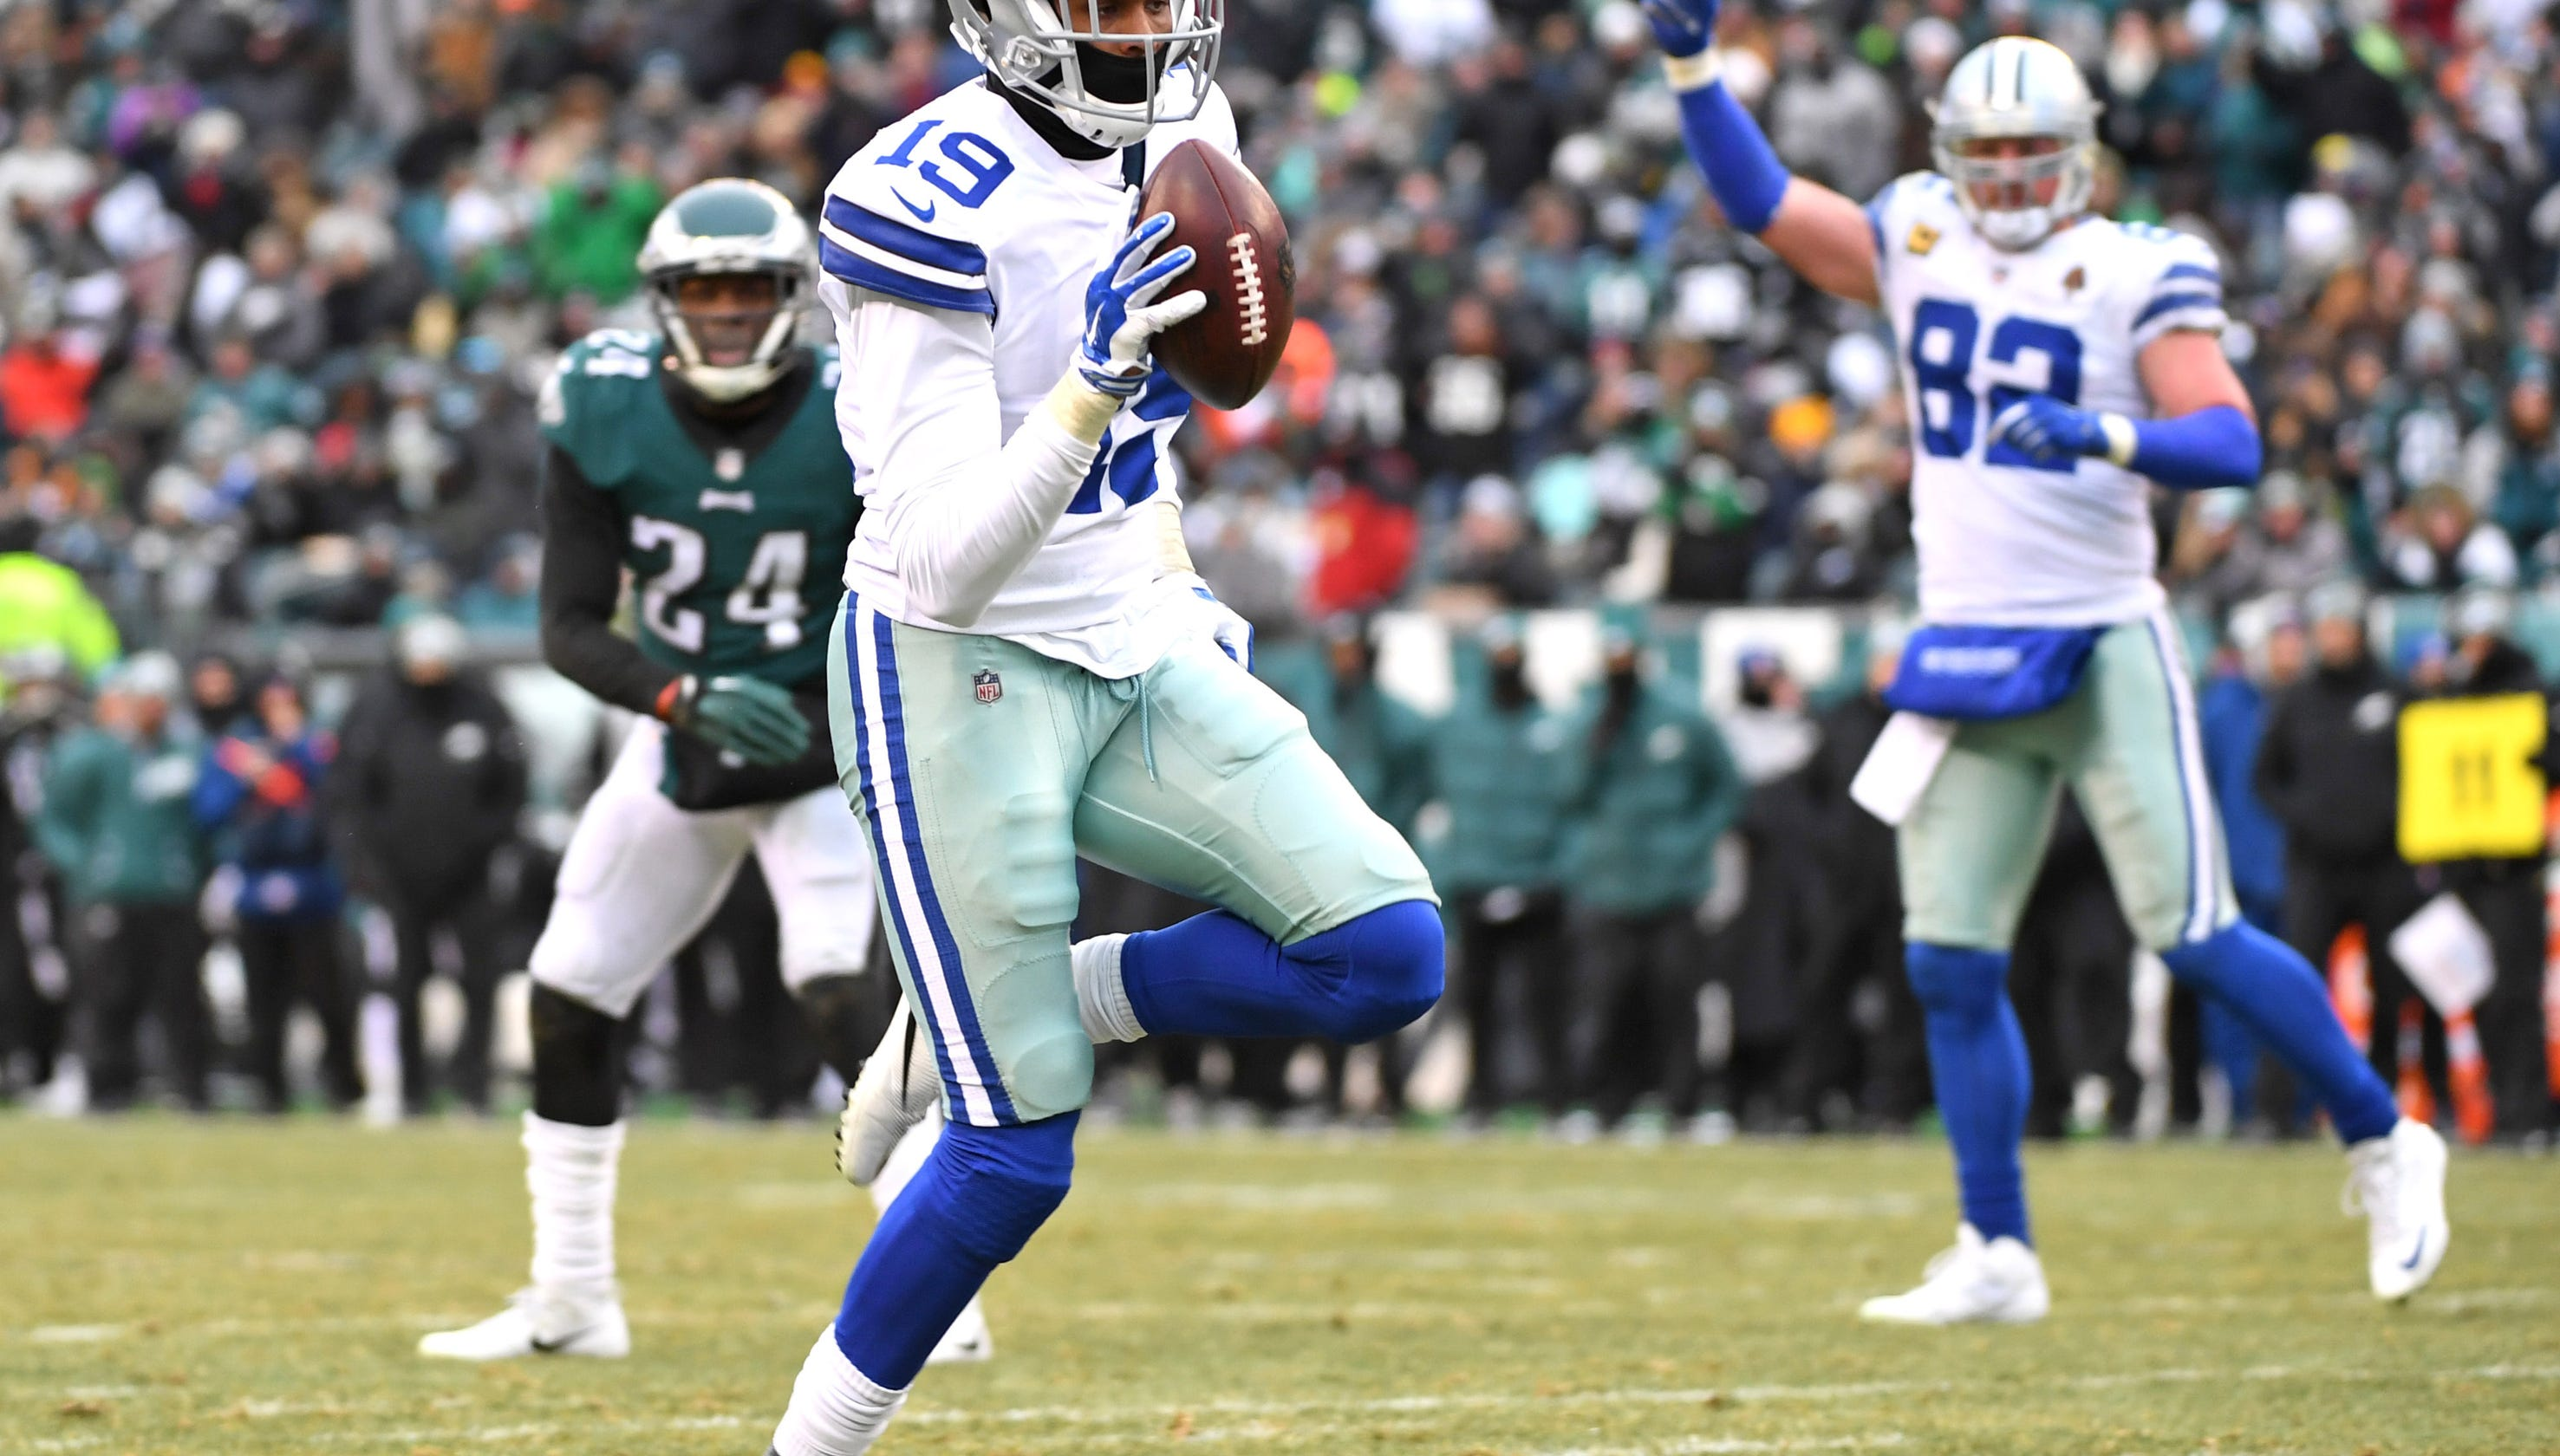 c31d0a72ad6 Cowboys bringing back wide receiver Brice Butler